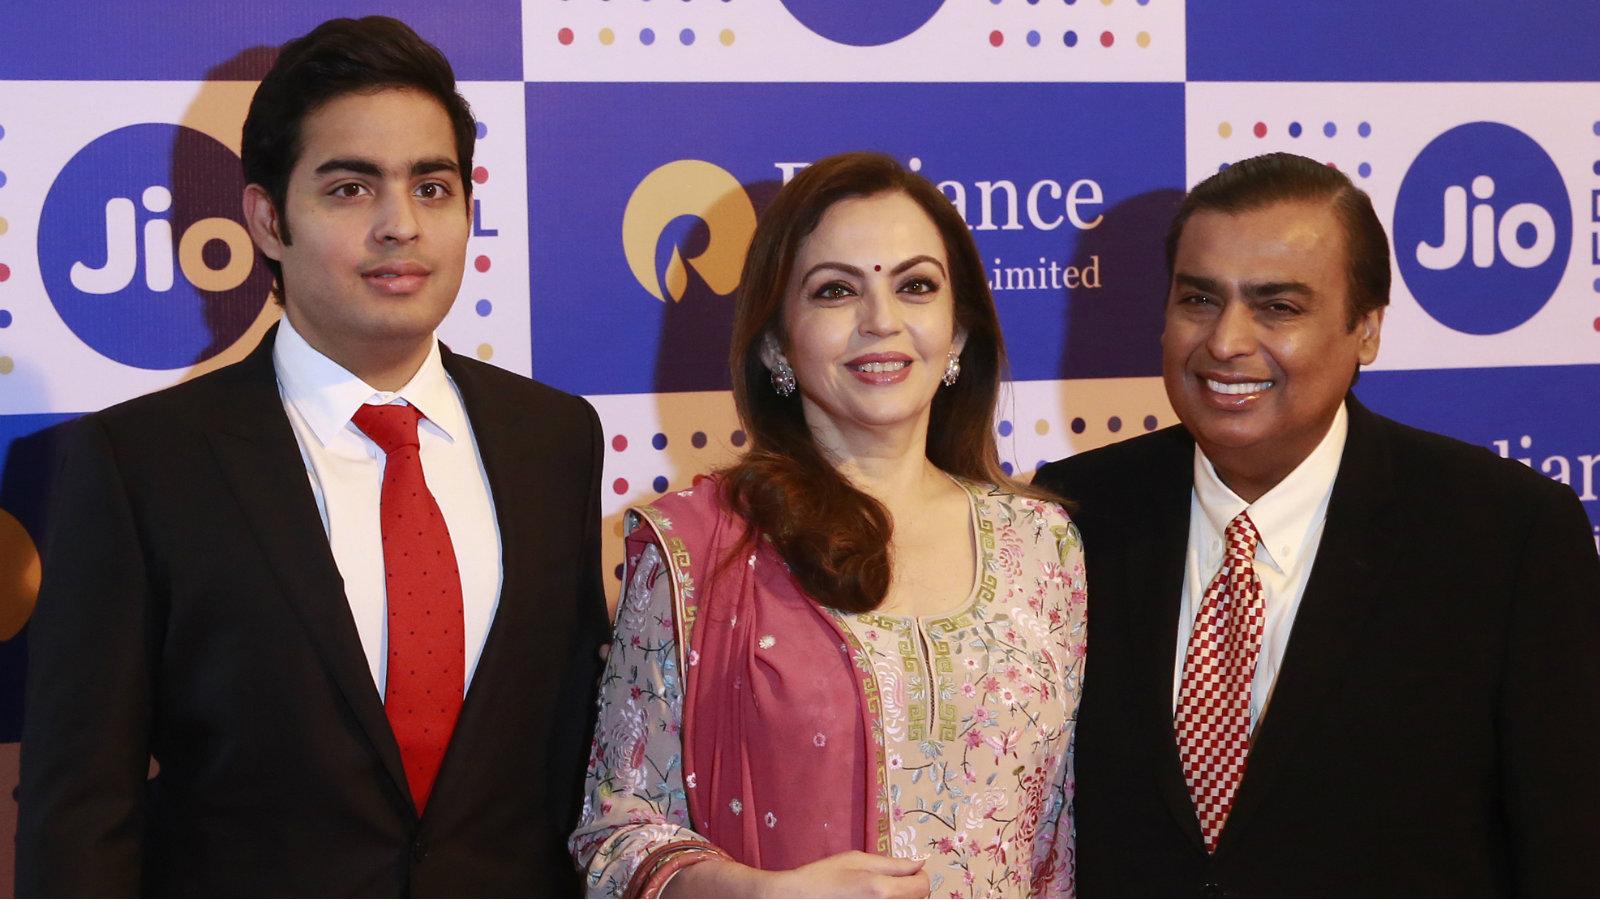 Mukesh-Ambani-Reliance-Industries-India